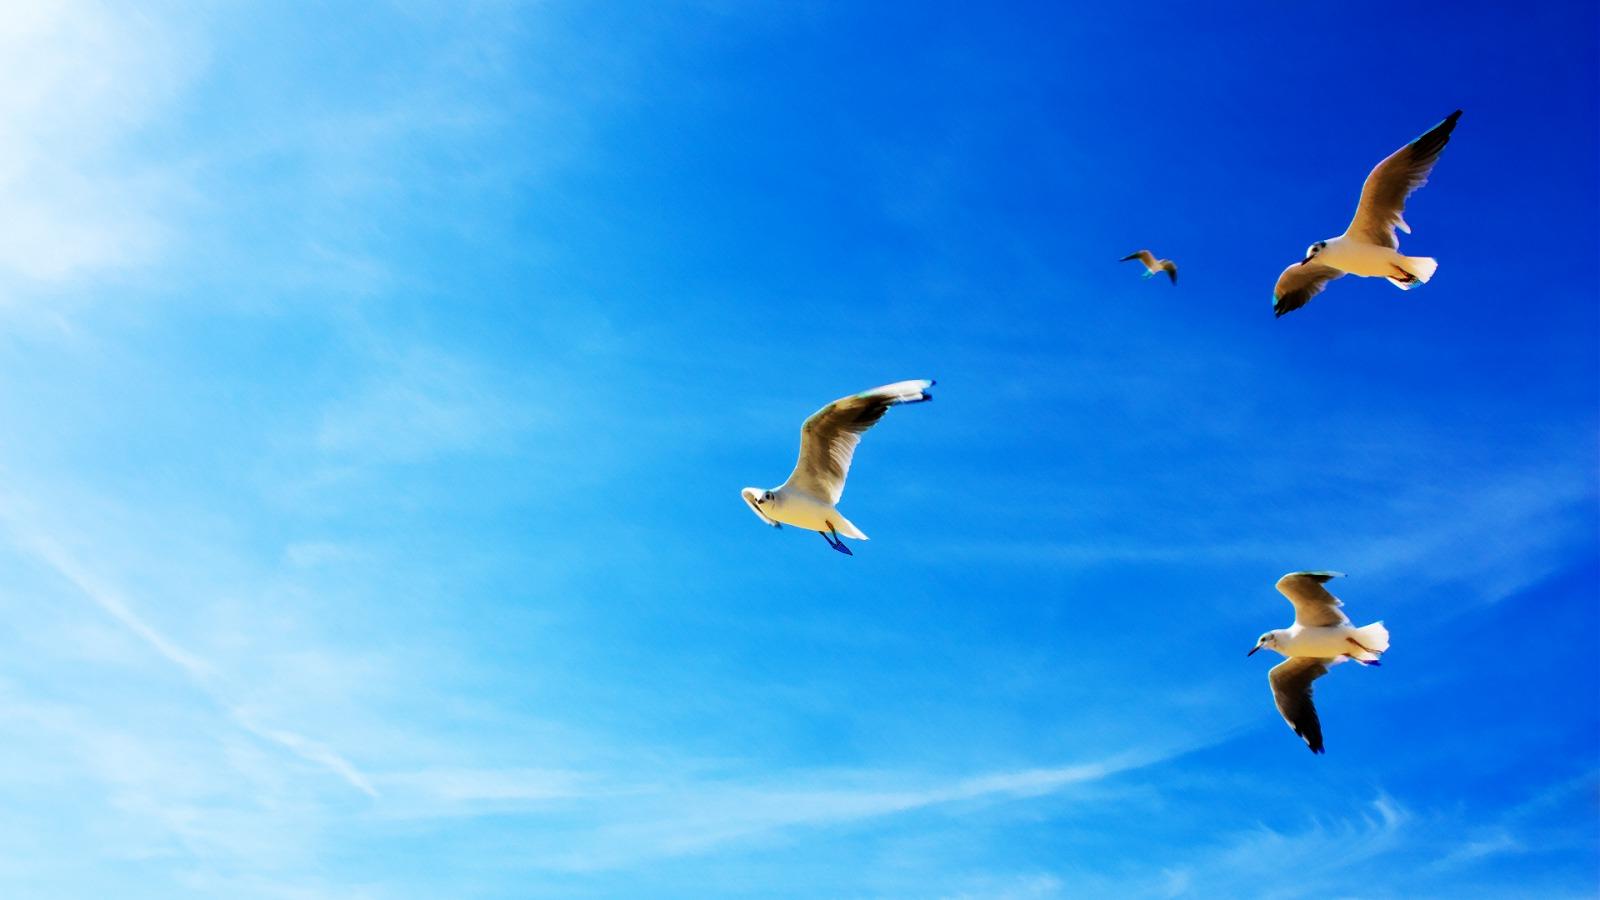 seagulls wallpapers